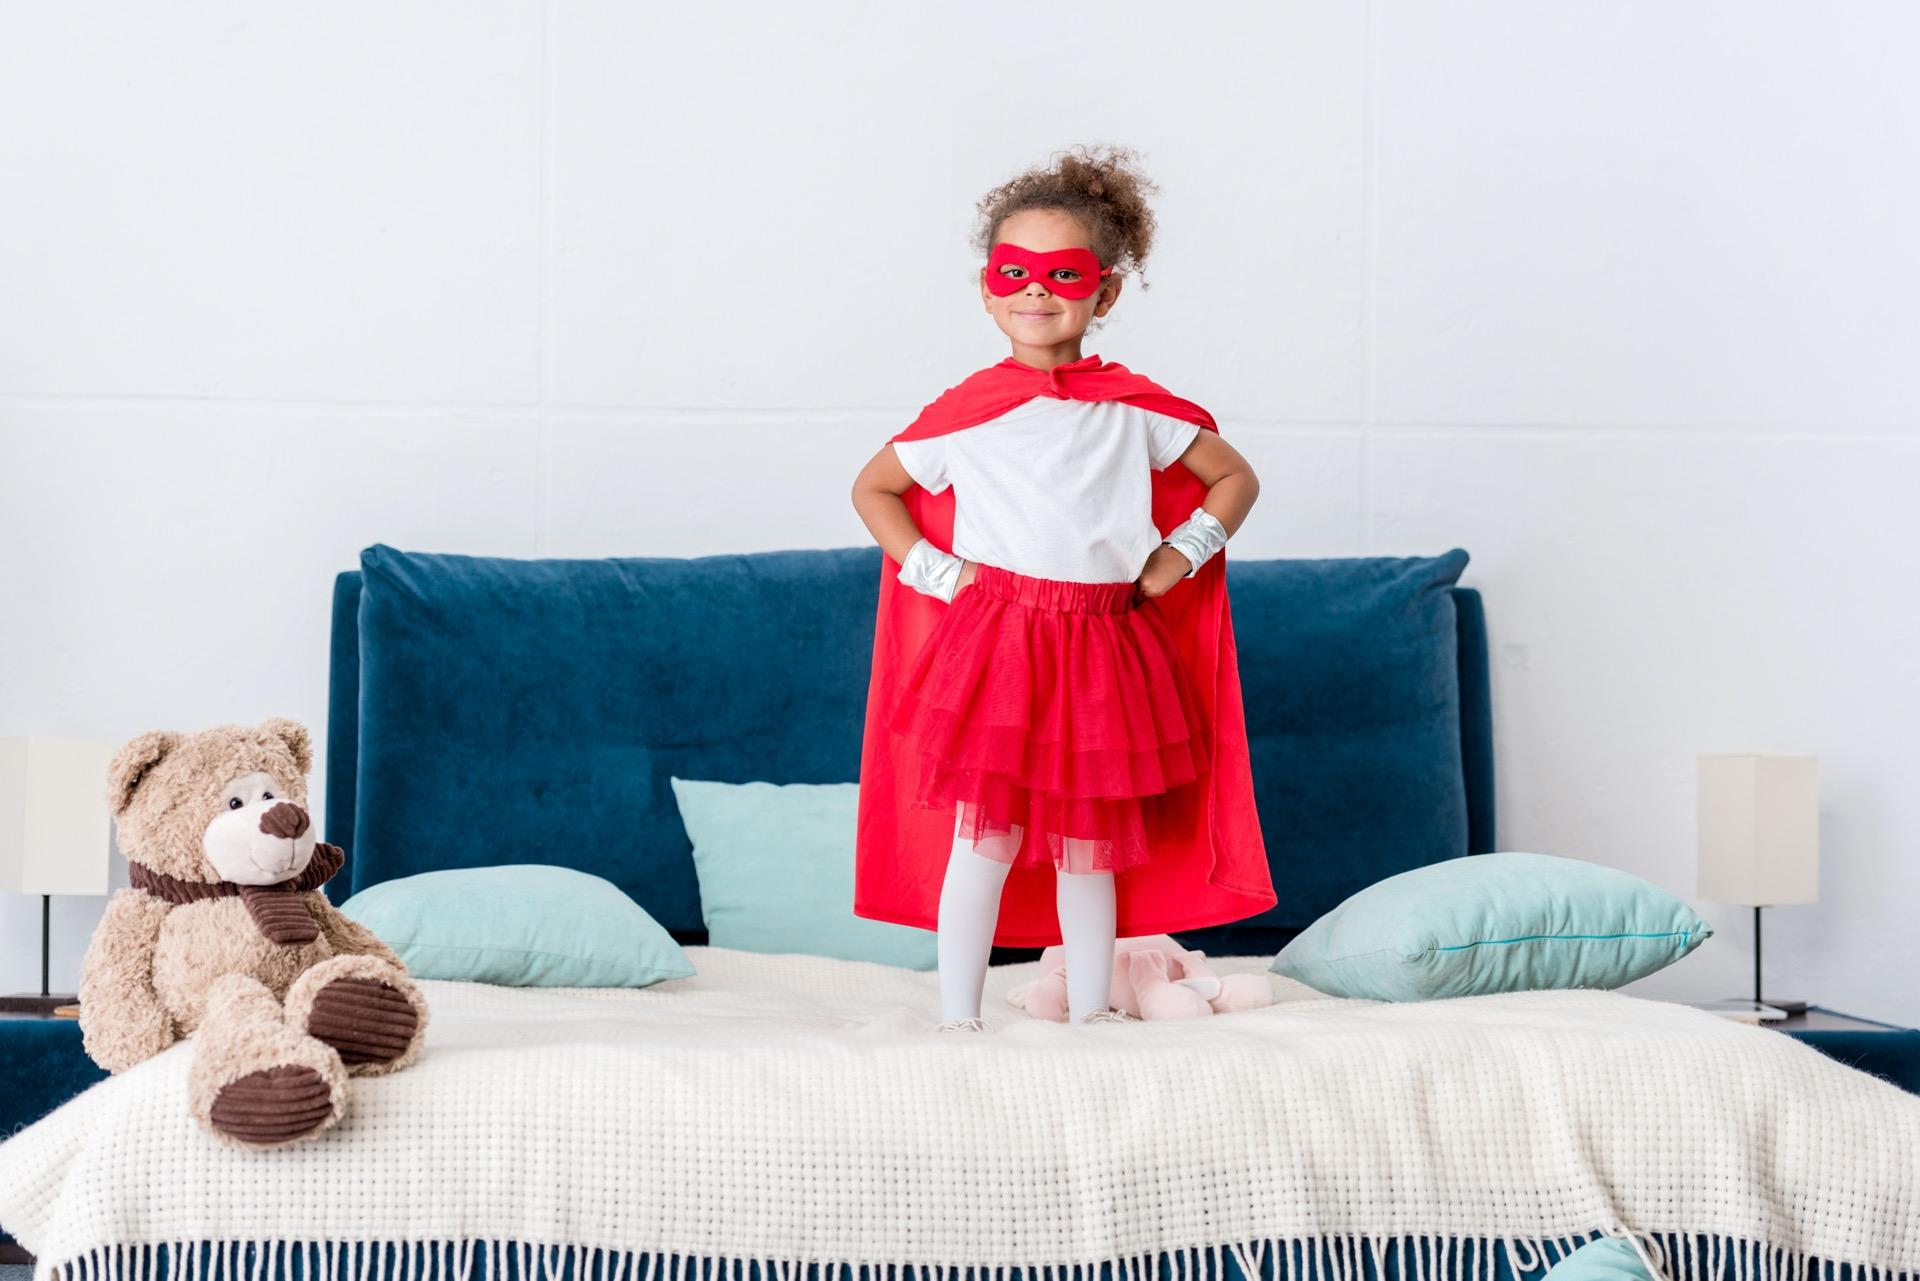 Resilienz bei Kindern fördern